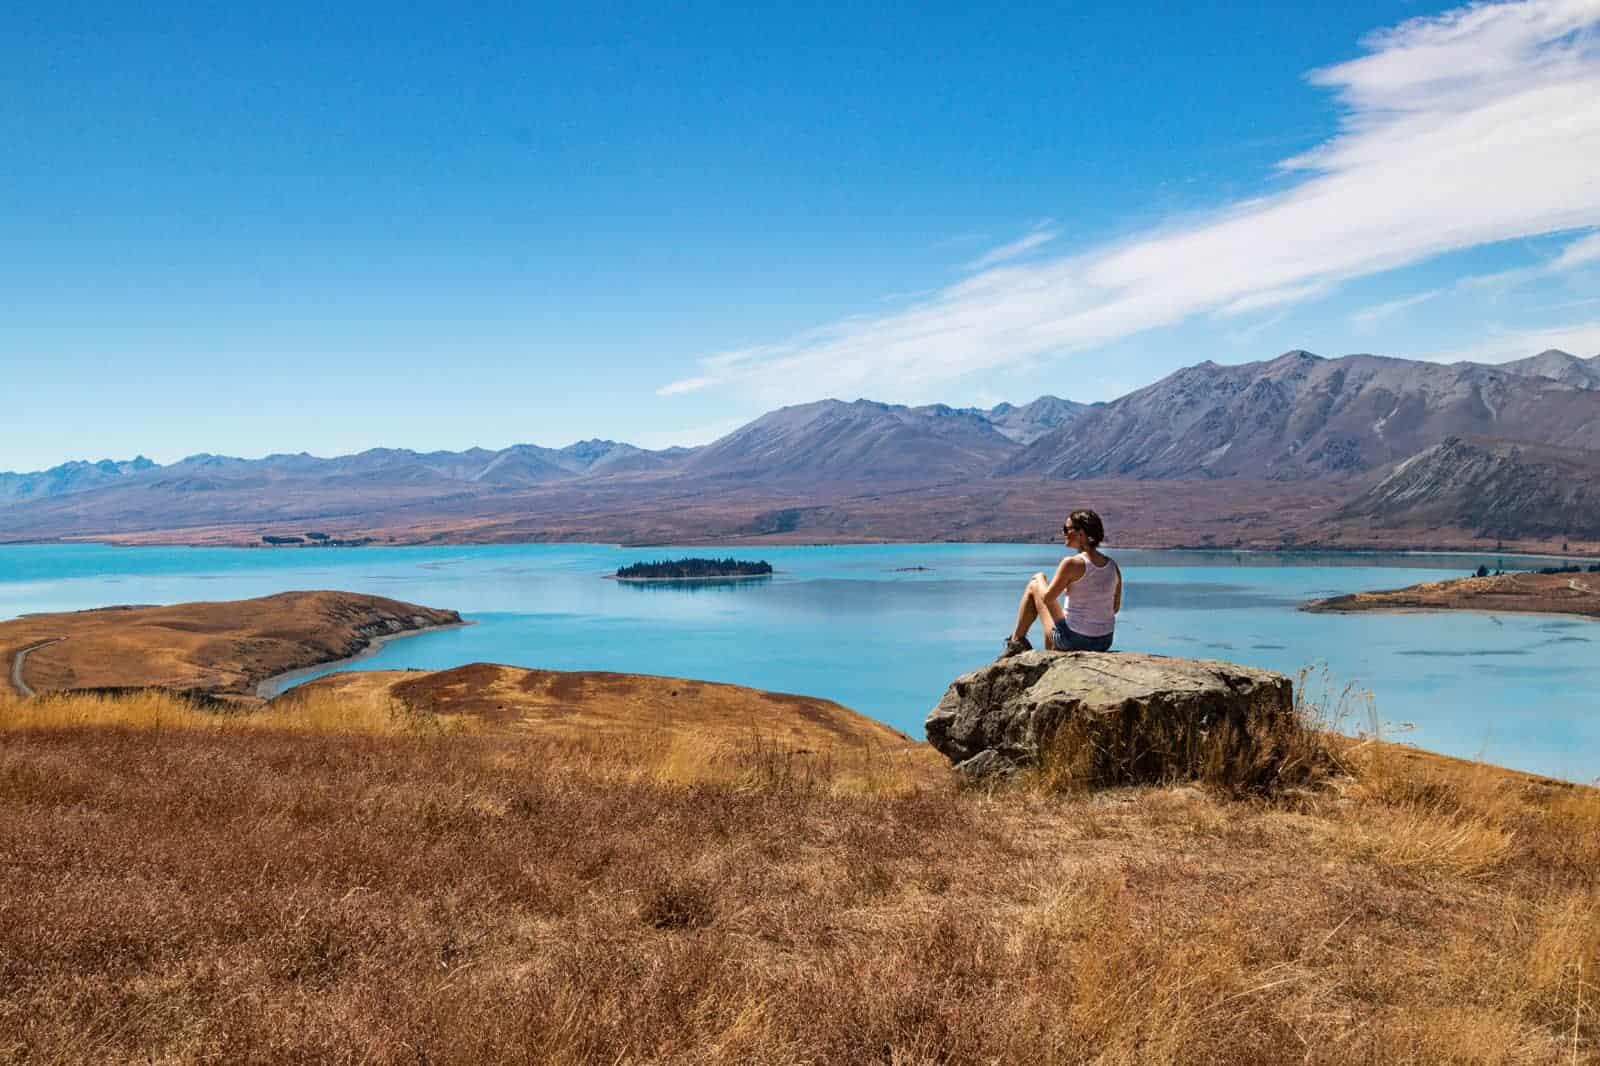 An Adventurer's Guide to Exploring Lake Tekapo, New Zealand